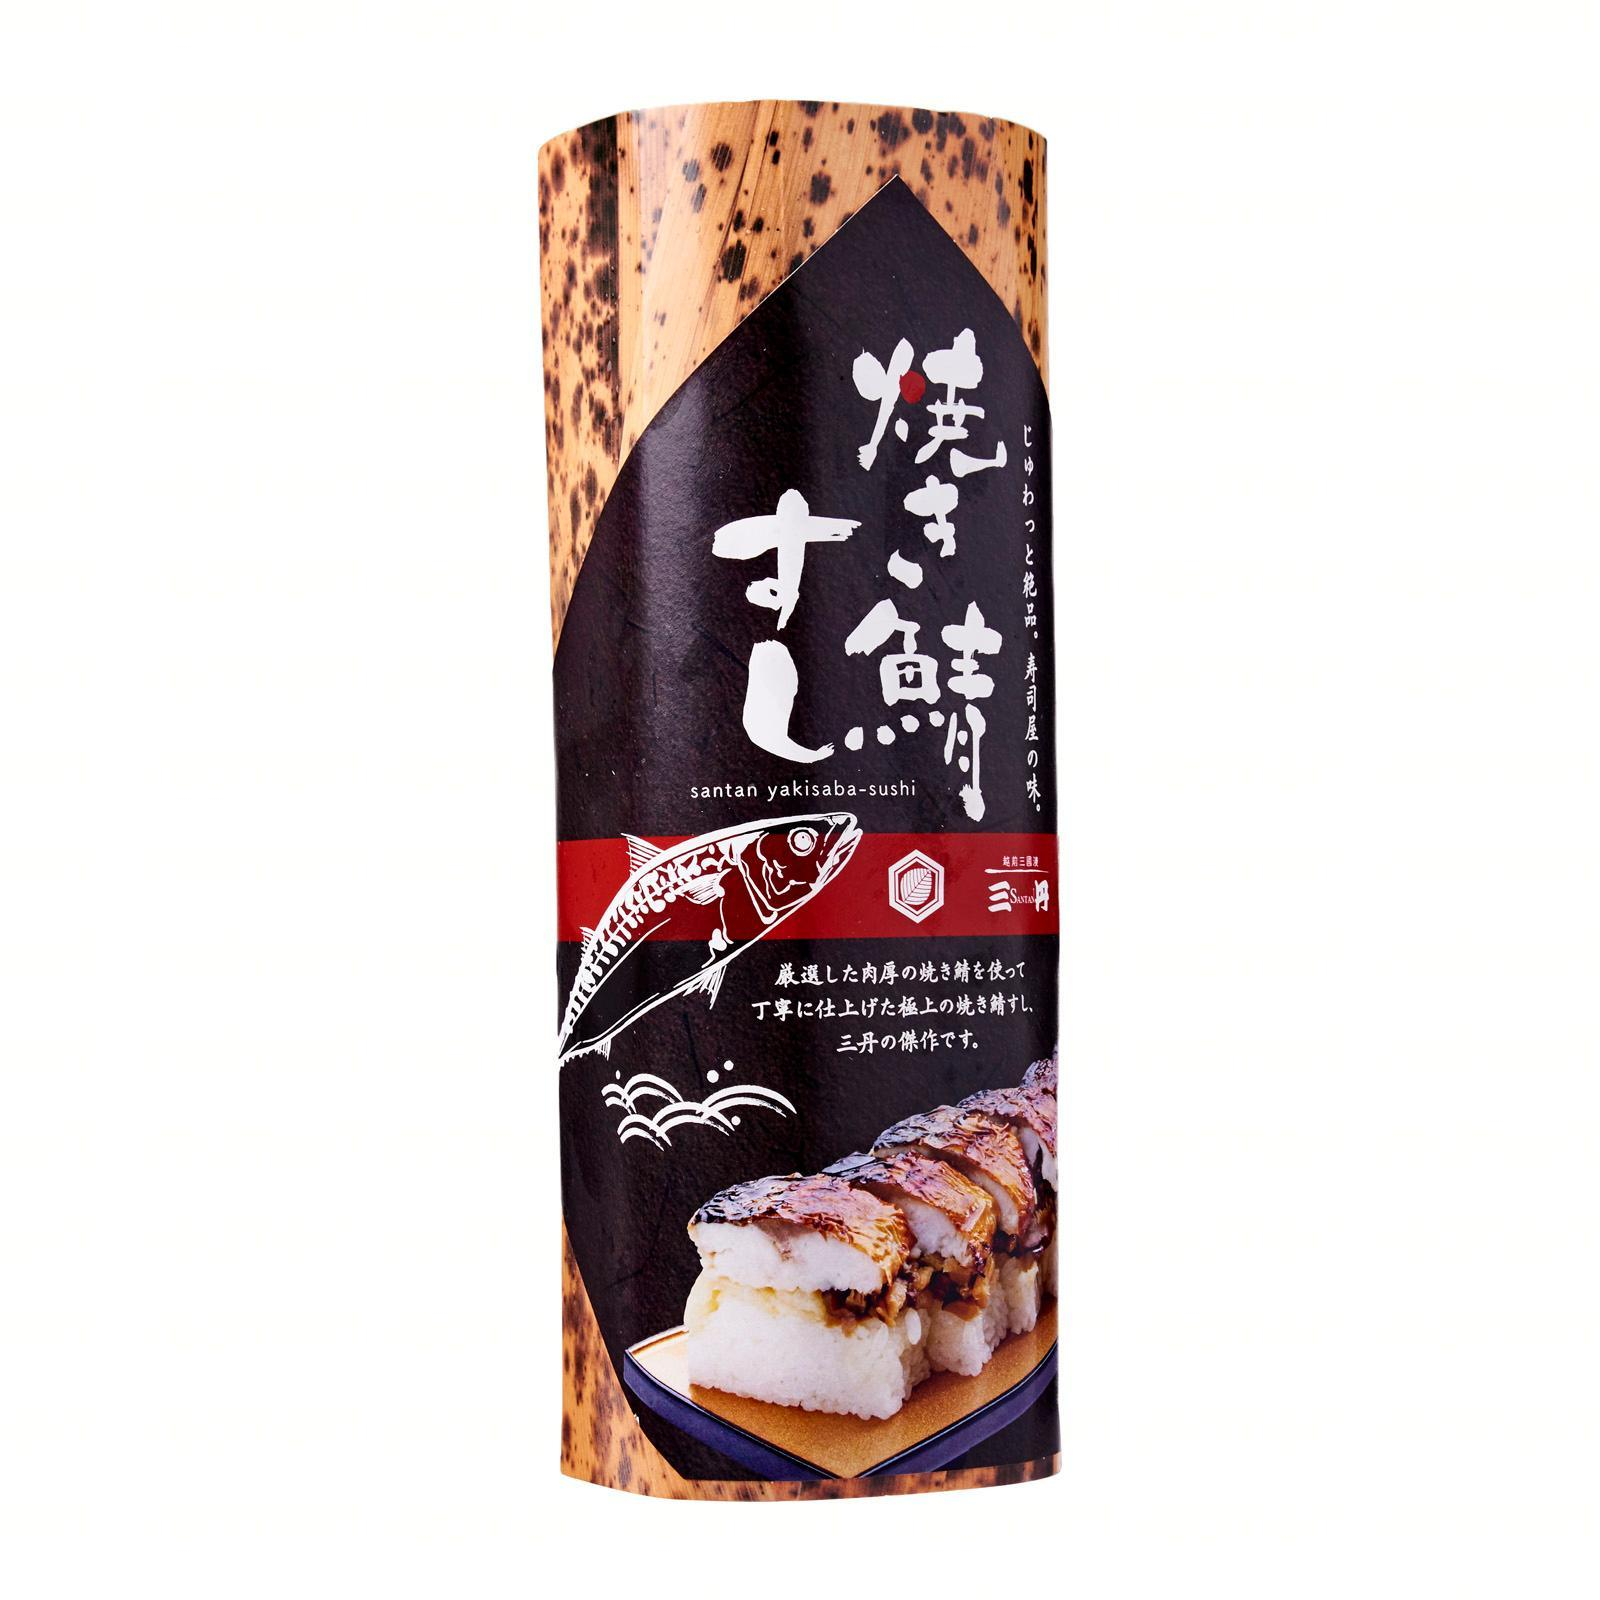 Santan Grilled Mackerel Yakisaba Pressed Sushi - Frozen - Jetro Special